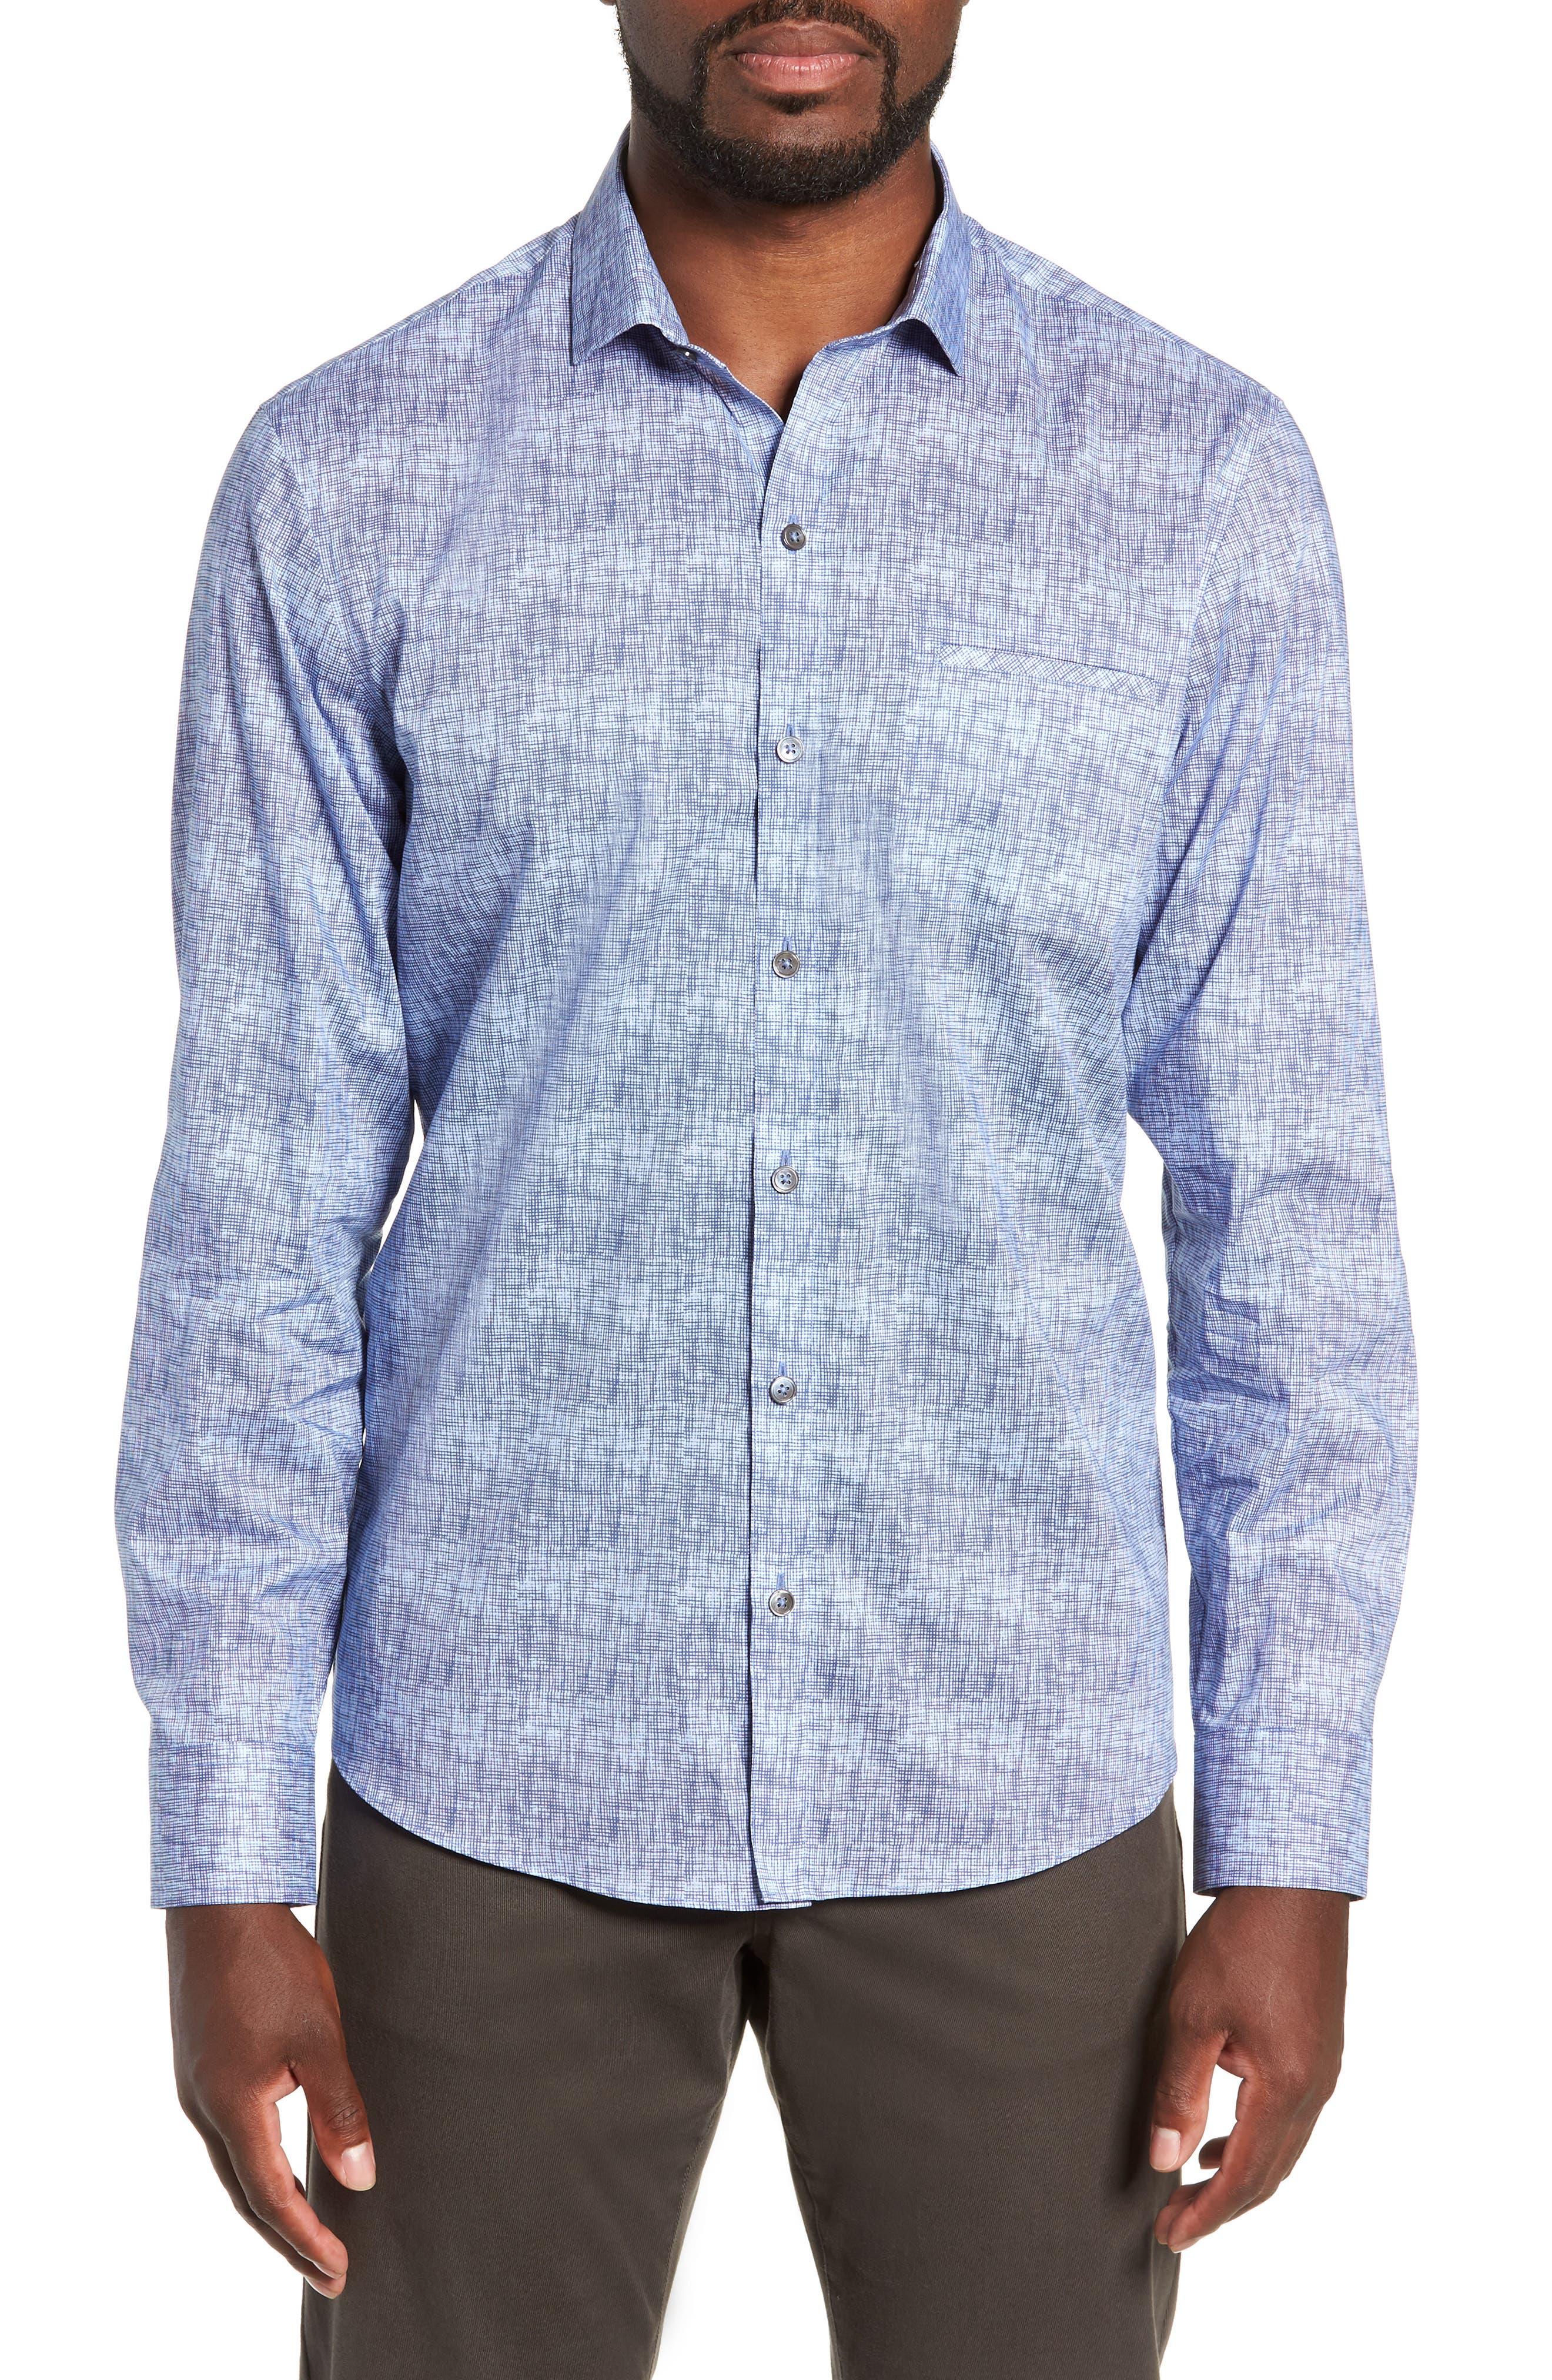 Oppong Sport Shirt,                         Main,                         color, BLUE